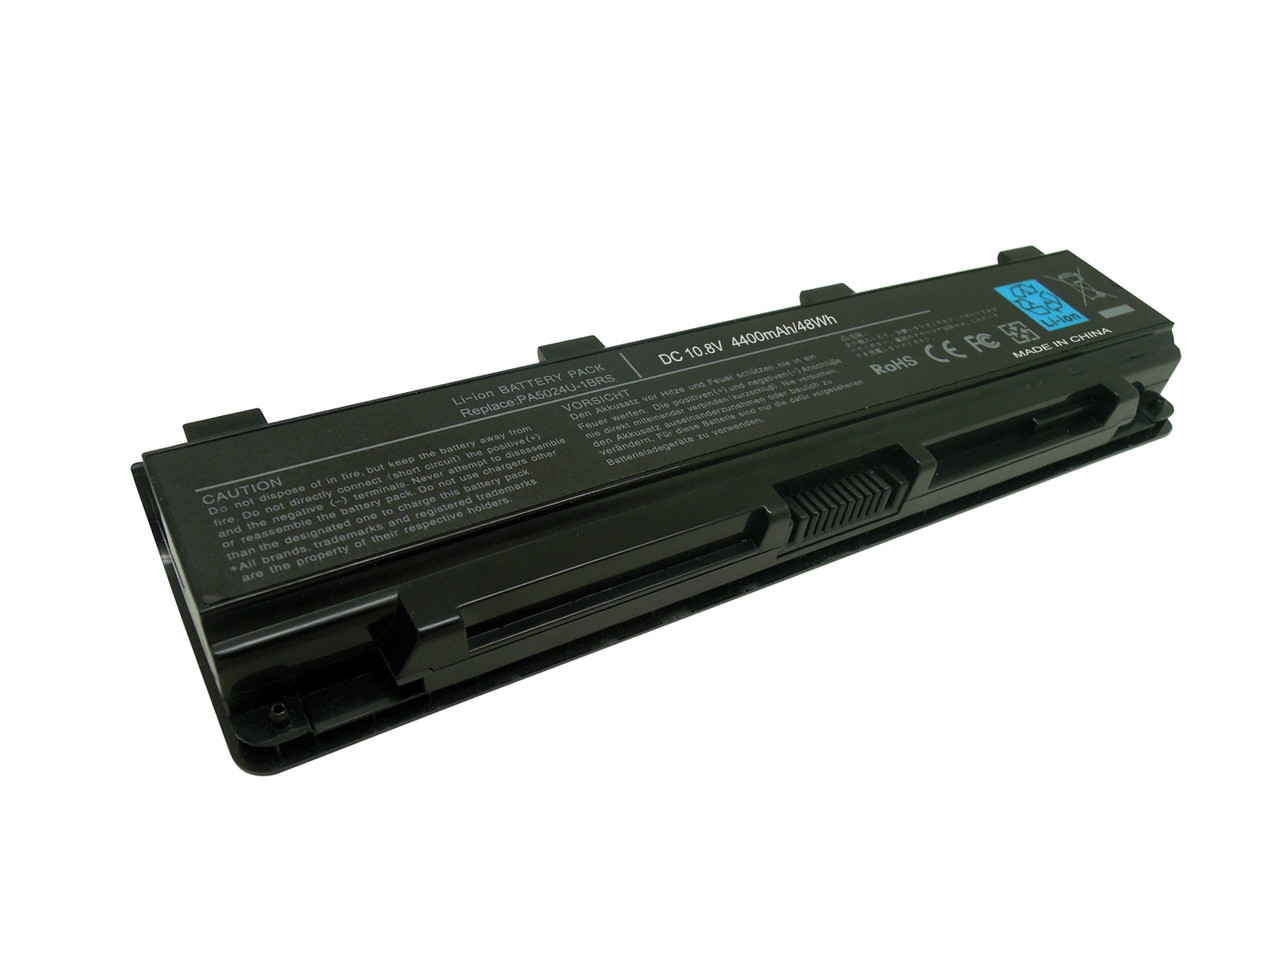 Аккумулятор для ноутбука TOSHIBA SATELLITE C875D-S7345